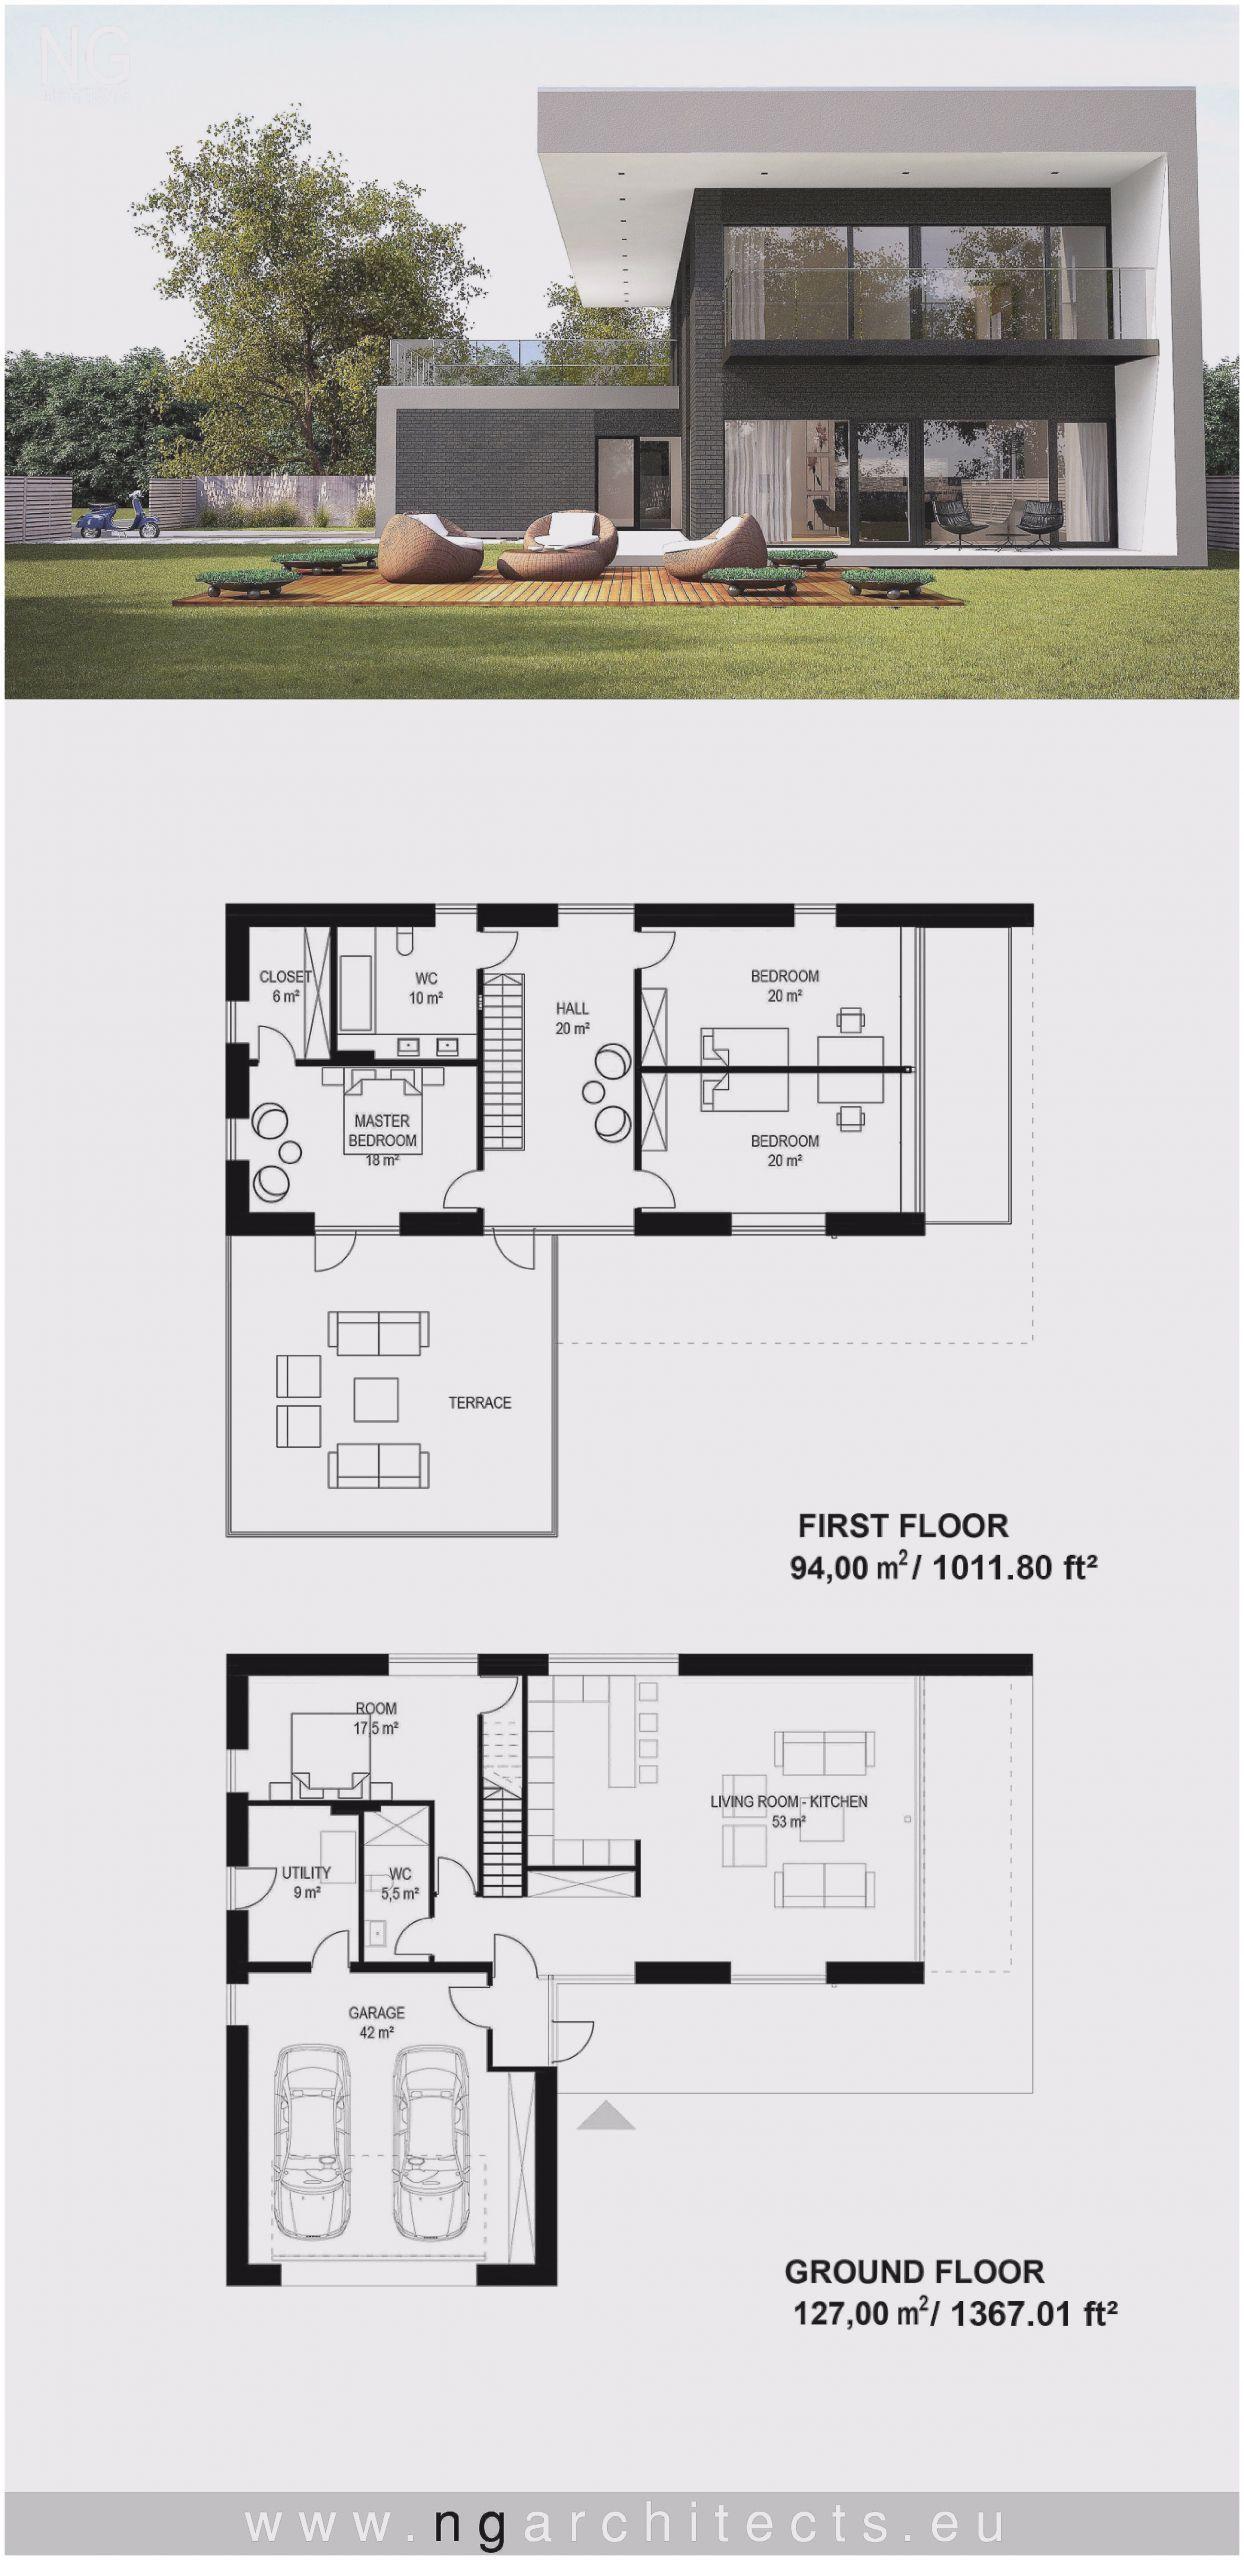 Single Story Modern House Plans Of Homeplans Architectural House Plans Modern Villa Design Villa Design